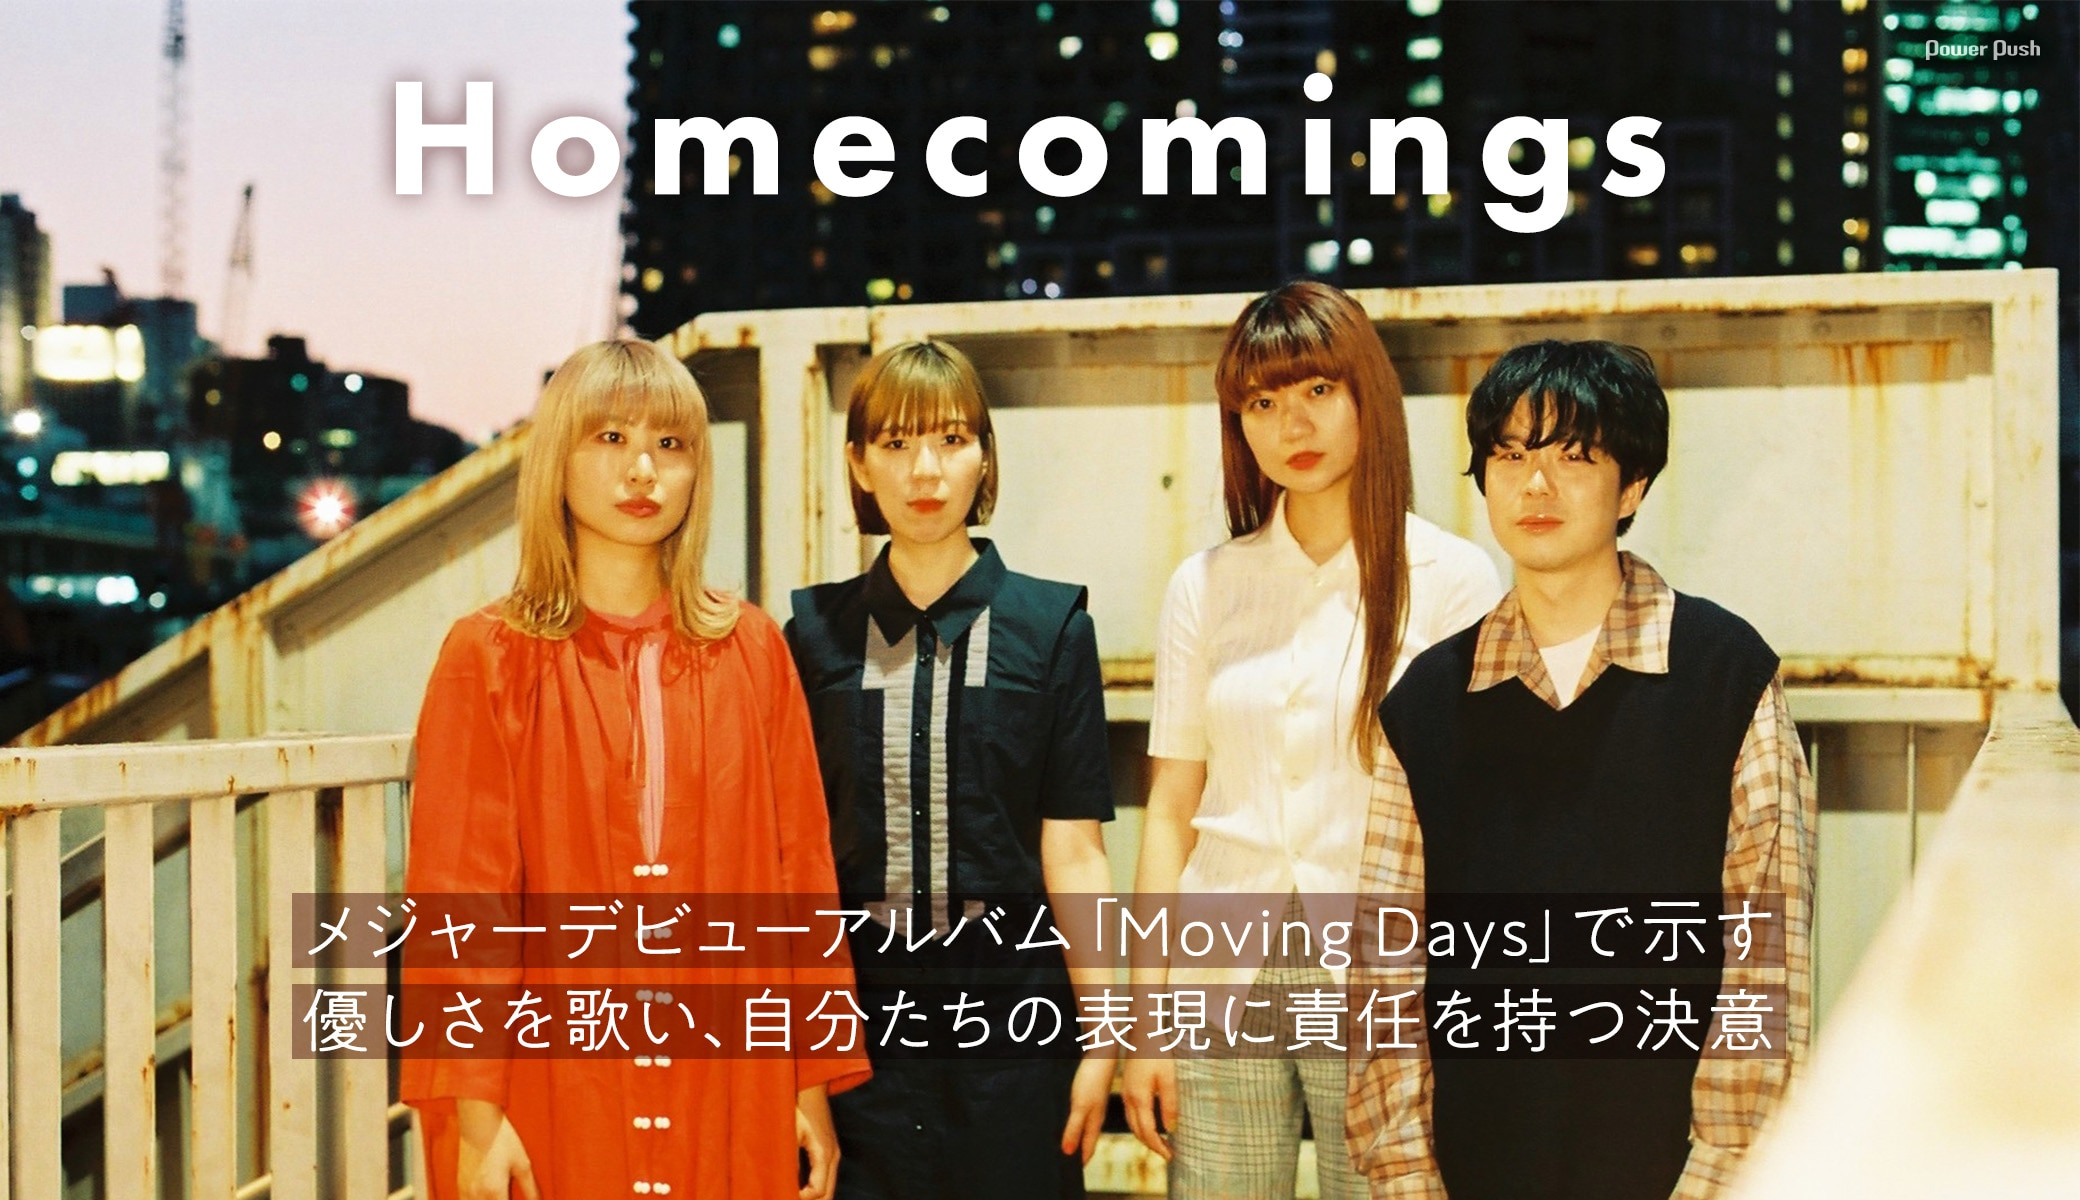 Homecomings メジャーデビューアルバム「Moving Days」で示す 優しさを歌い、自分たちの表現に責任を持つ決意